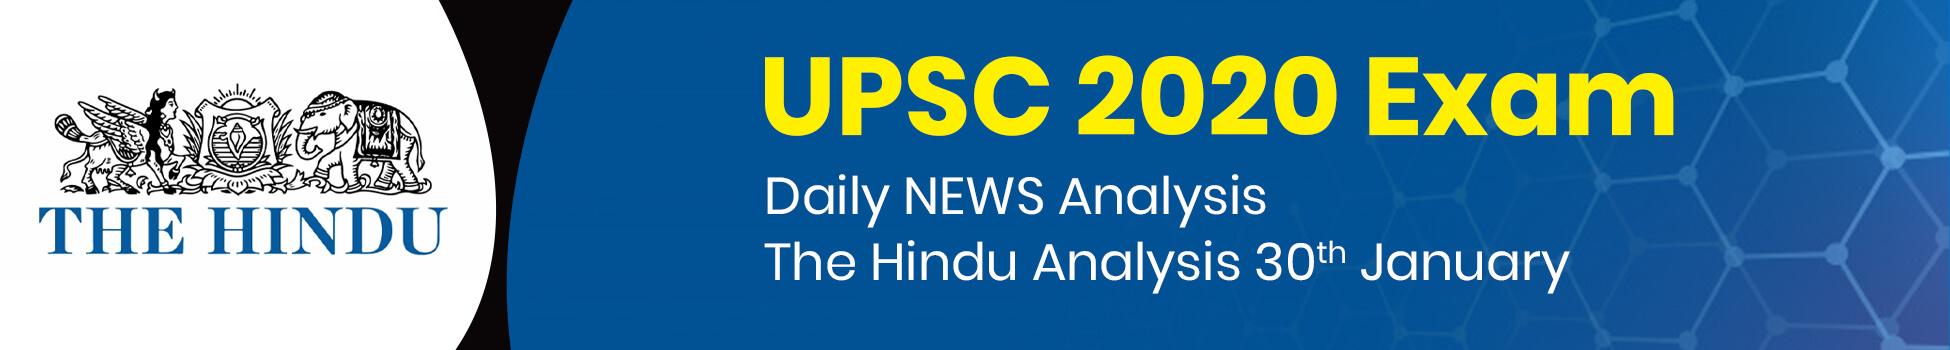 Daily NEWS Analysis | The Hindu Analysis 30th January | UPSC 2020 Exam